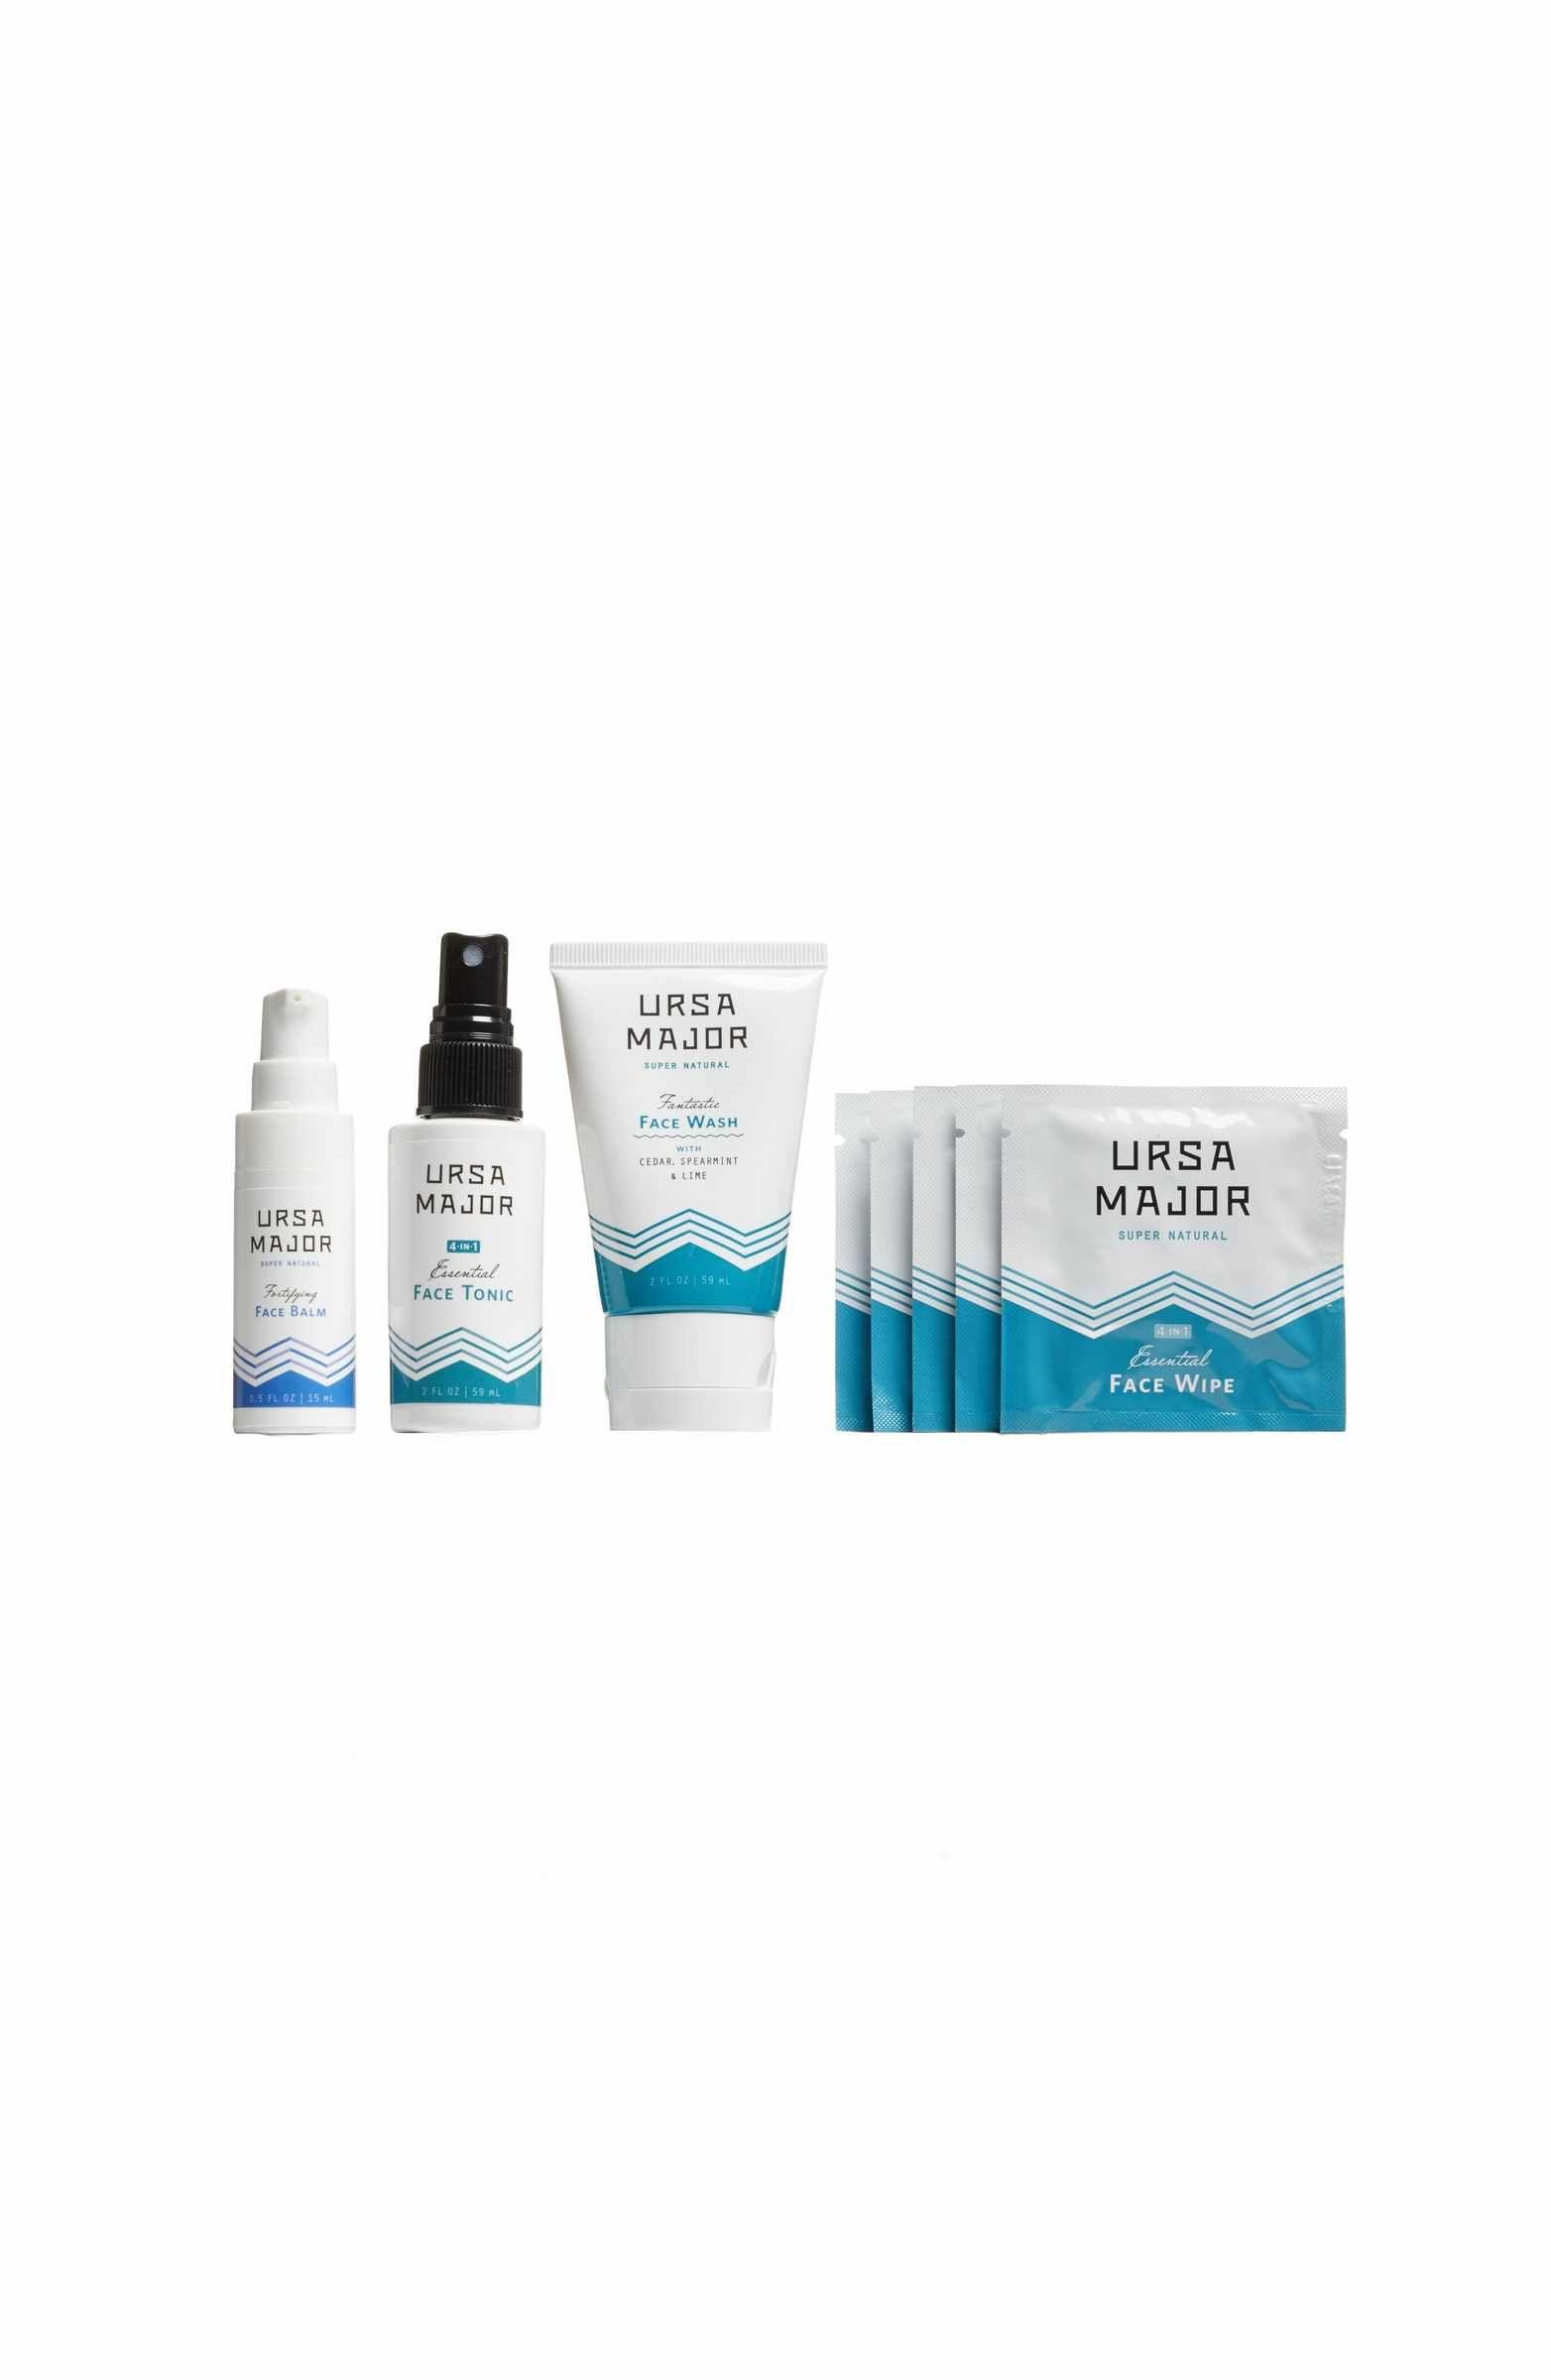 Main image ursa major the travelers skin care kit